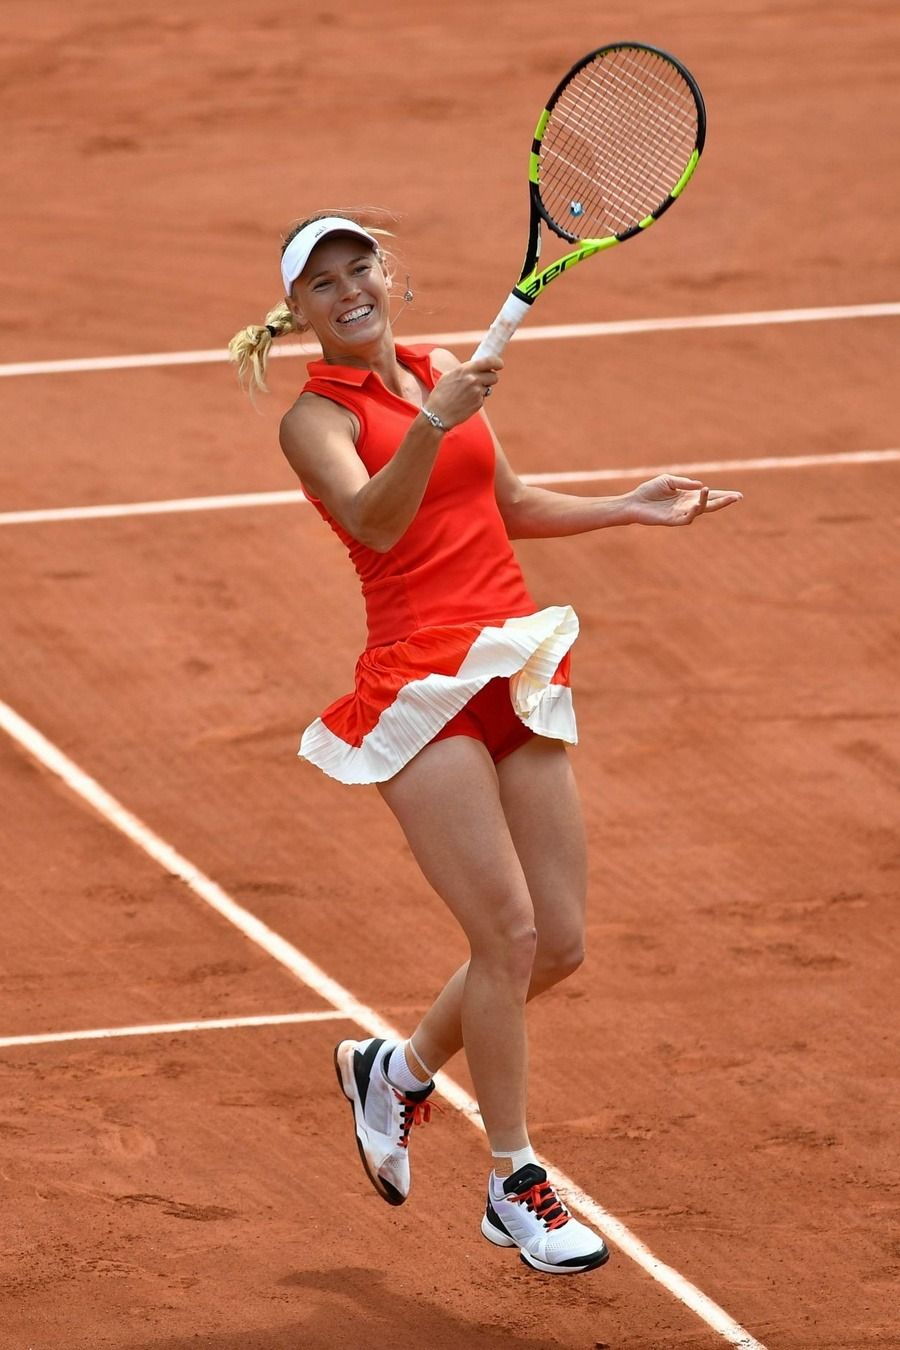 Caroline Wozniacki 2017 Roland Garros Caroline Wozniacki Caroline Wozniacki Tennis Tennis Players Female